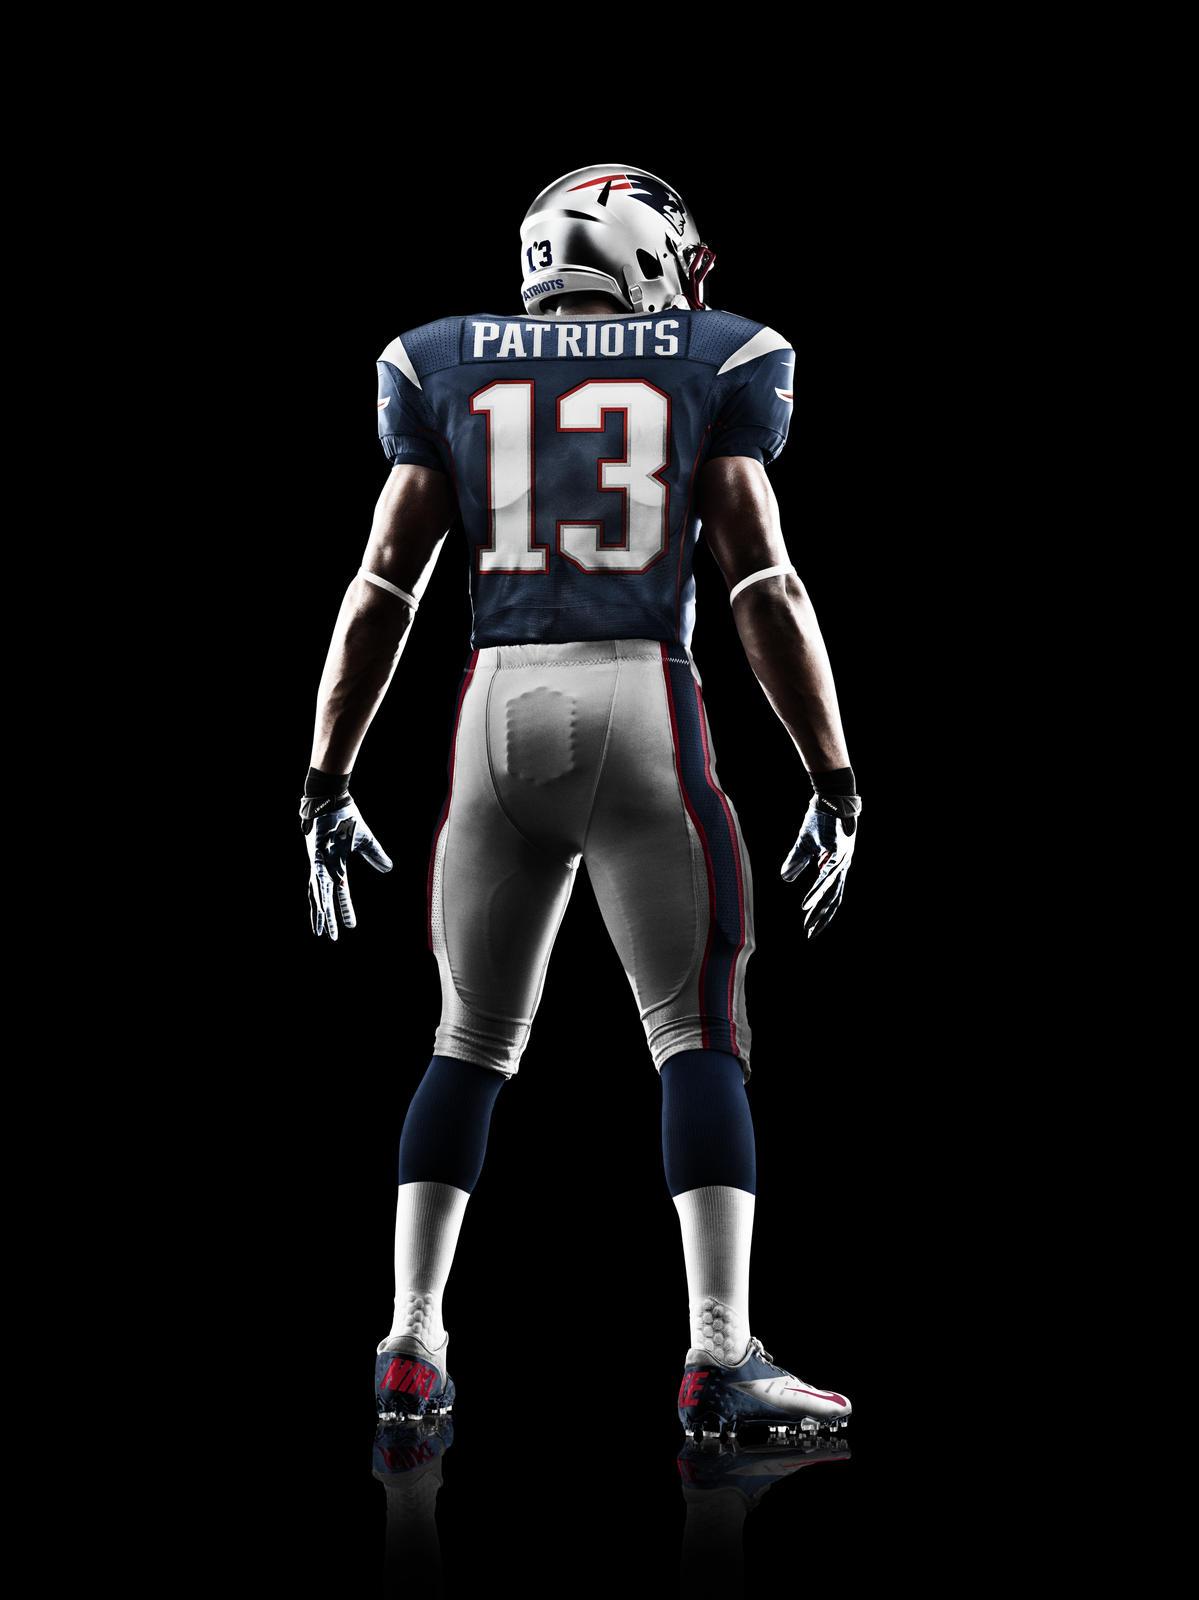 Patriots Iphone Wallpaper New England Patriots 2012 Nike Football Uniform Nike News